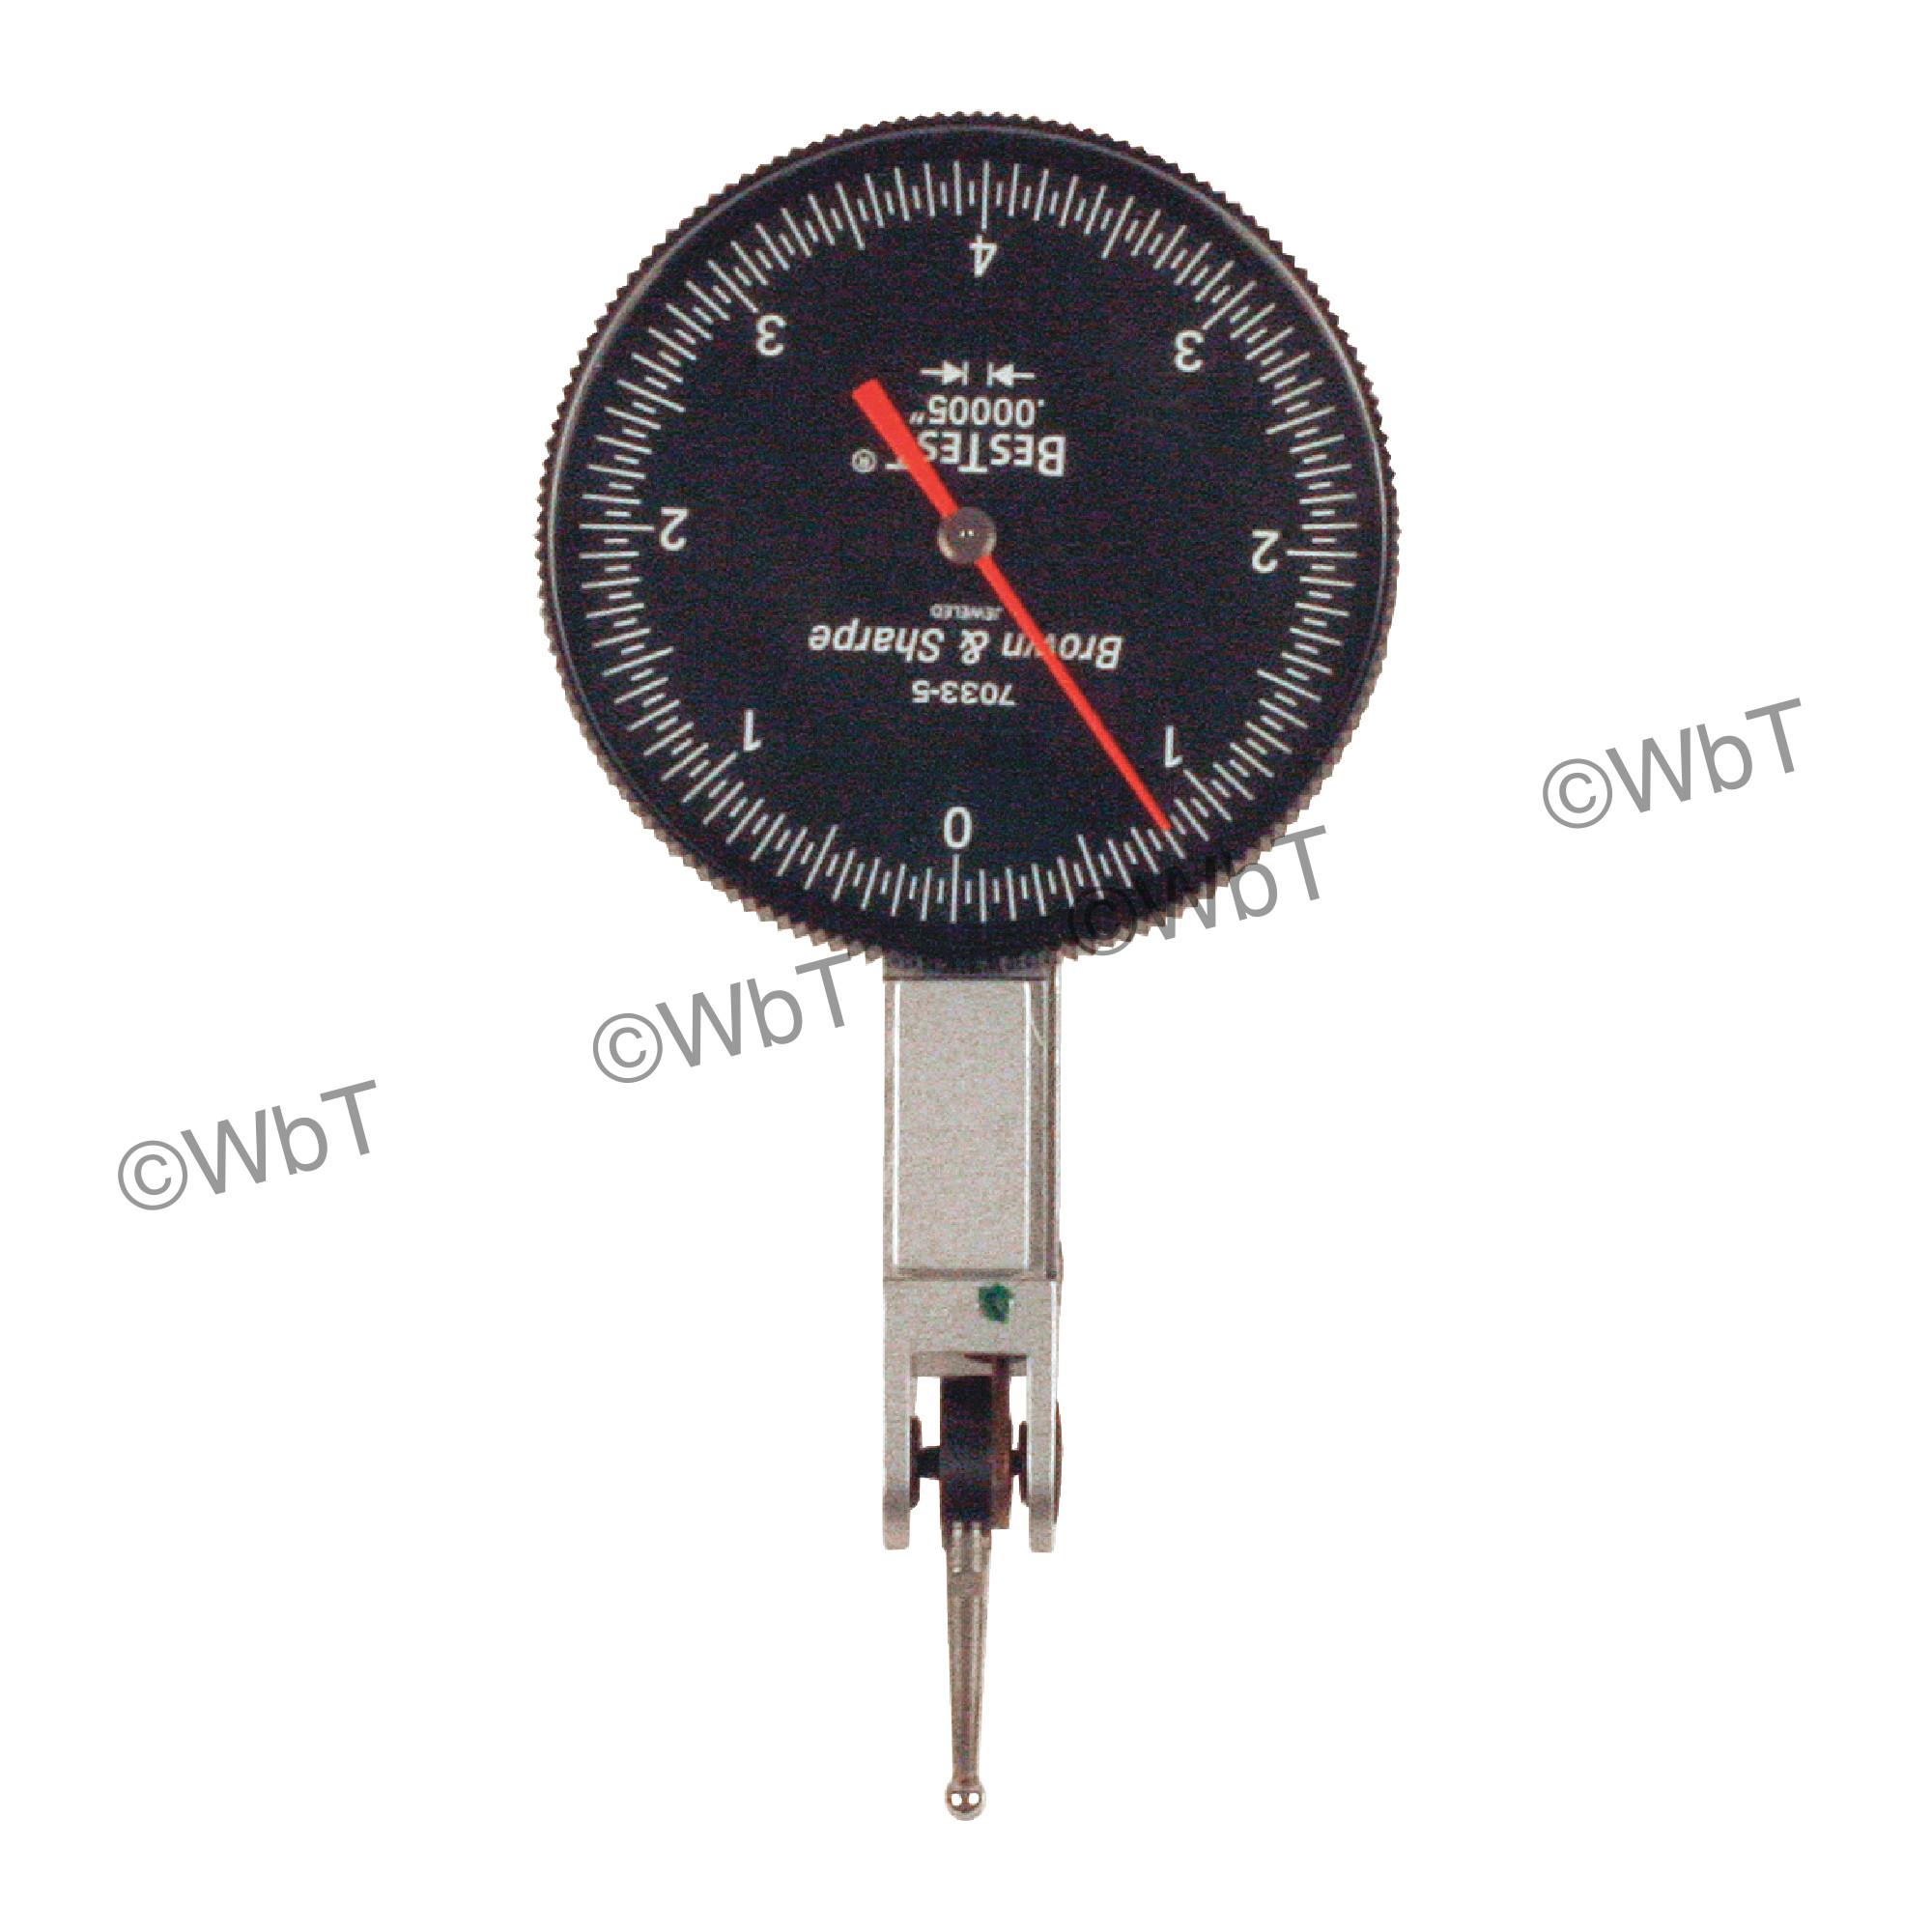 BesTest® Dial Test Indicator